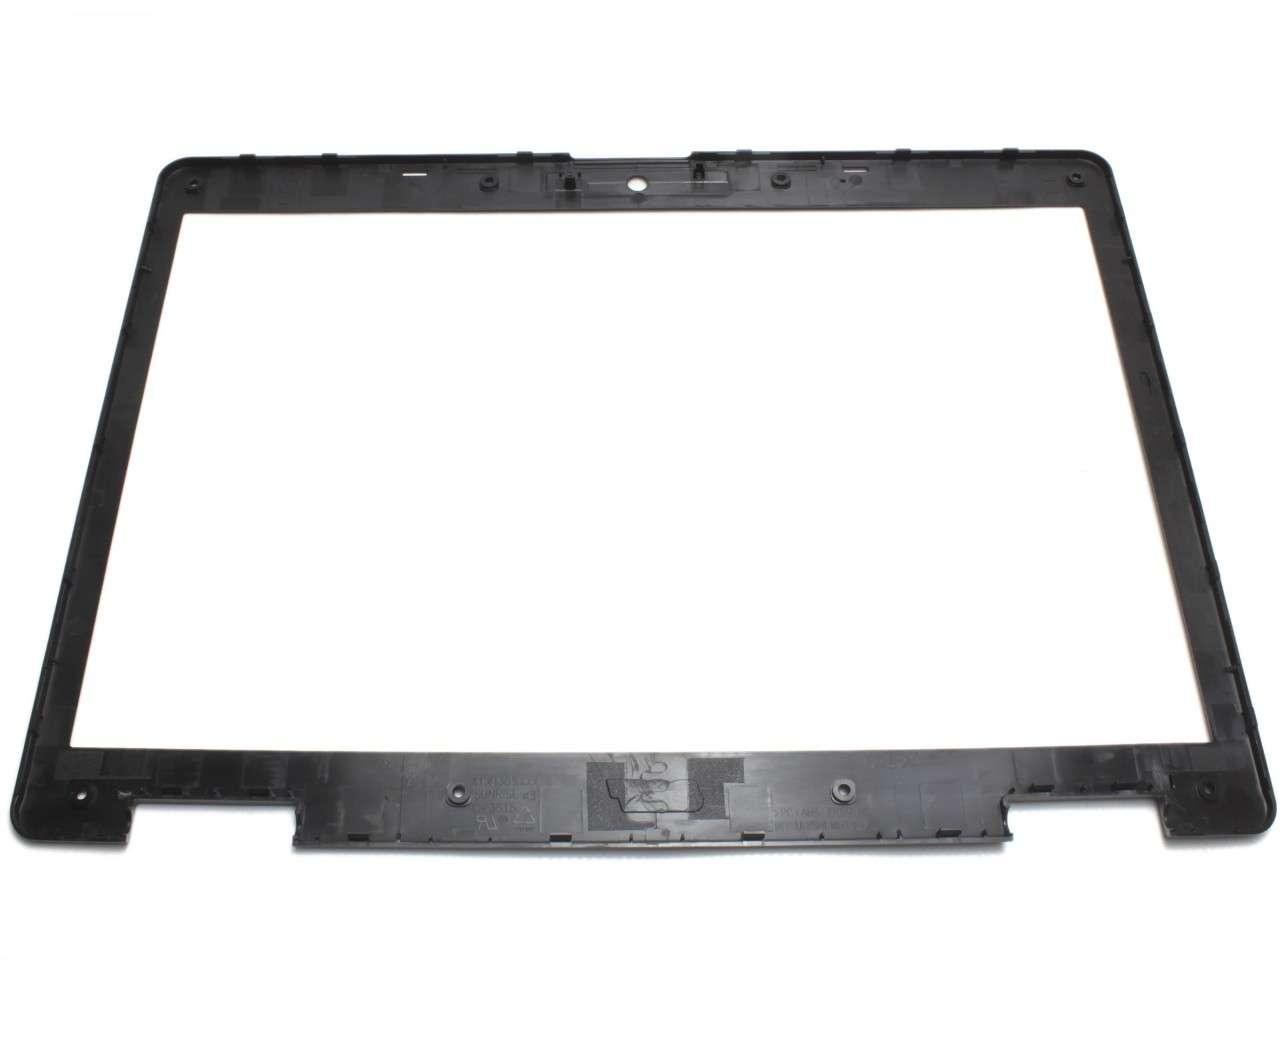 Rama Display Acer Extensa 5620g Bezel Front Cover Neagra imagine